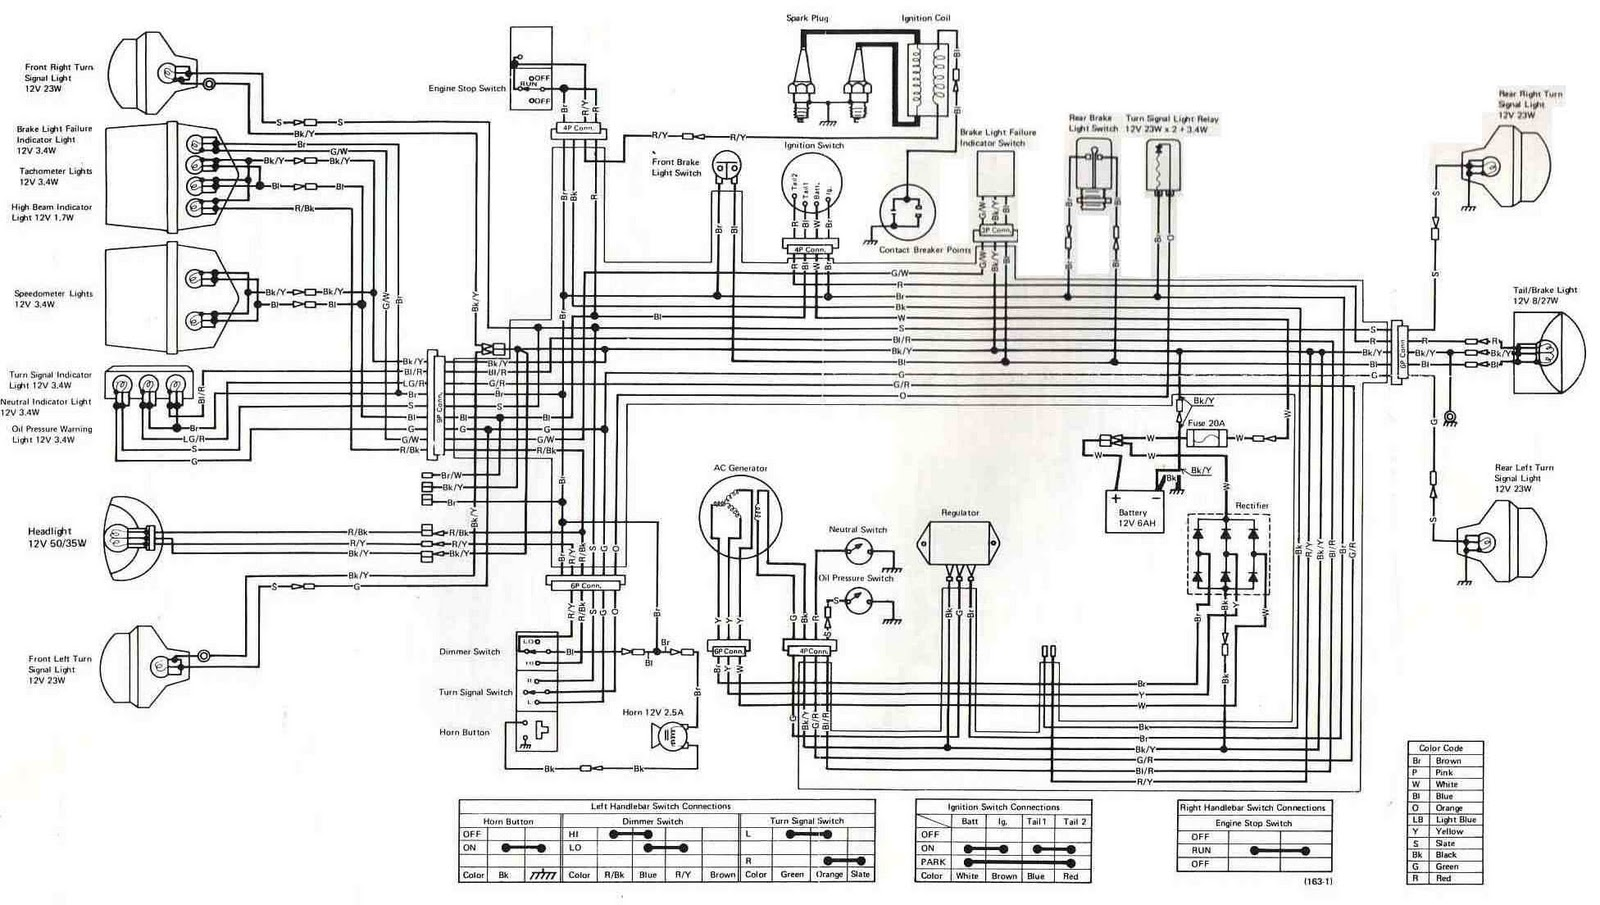 Kawasaki Wiring Diagram | Wiring Diagram Basic on kawasaki carburetor diagram, kawasaki trains, kawasaki bayou 220 wiring, onan parts diagrams, mercury outboard 115 hp diagrams, kawasaki 110 atv, john deere electrical diagrams,